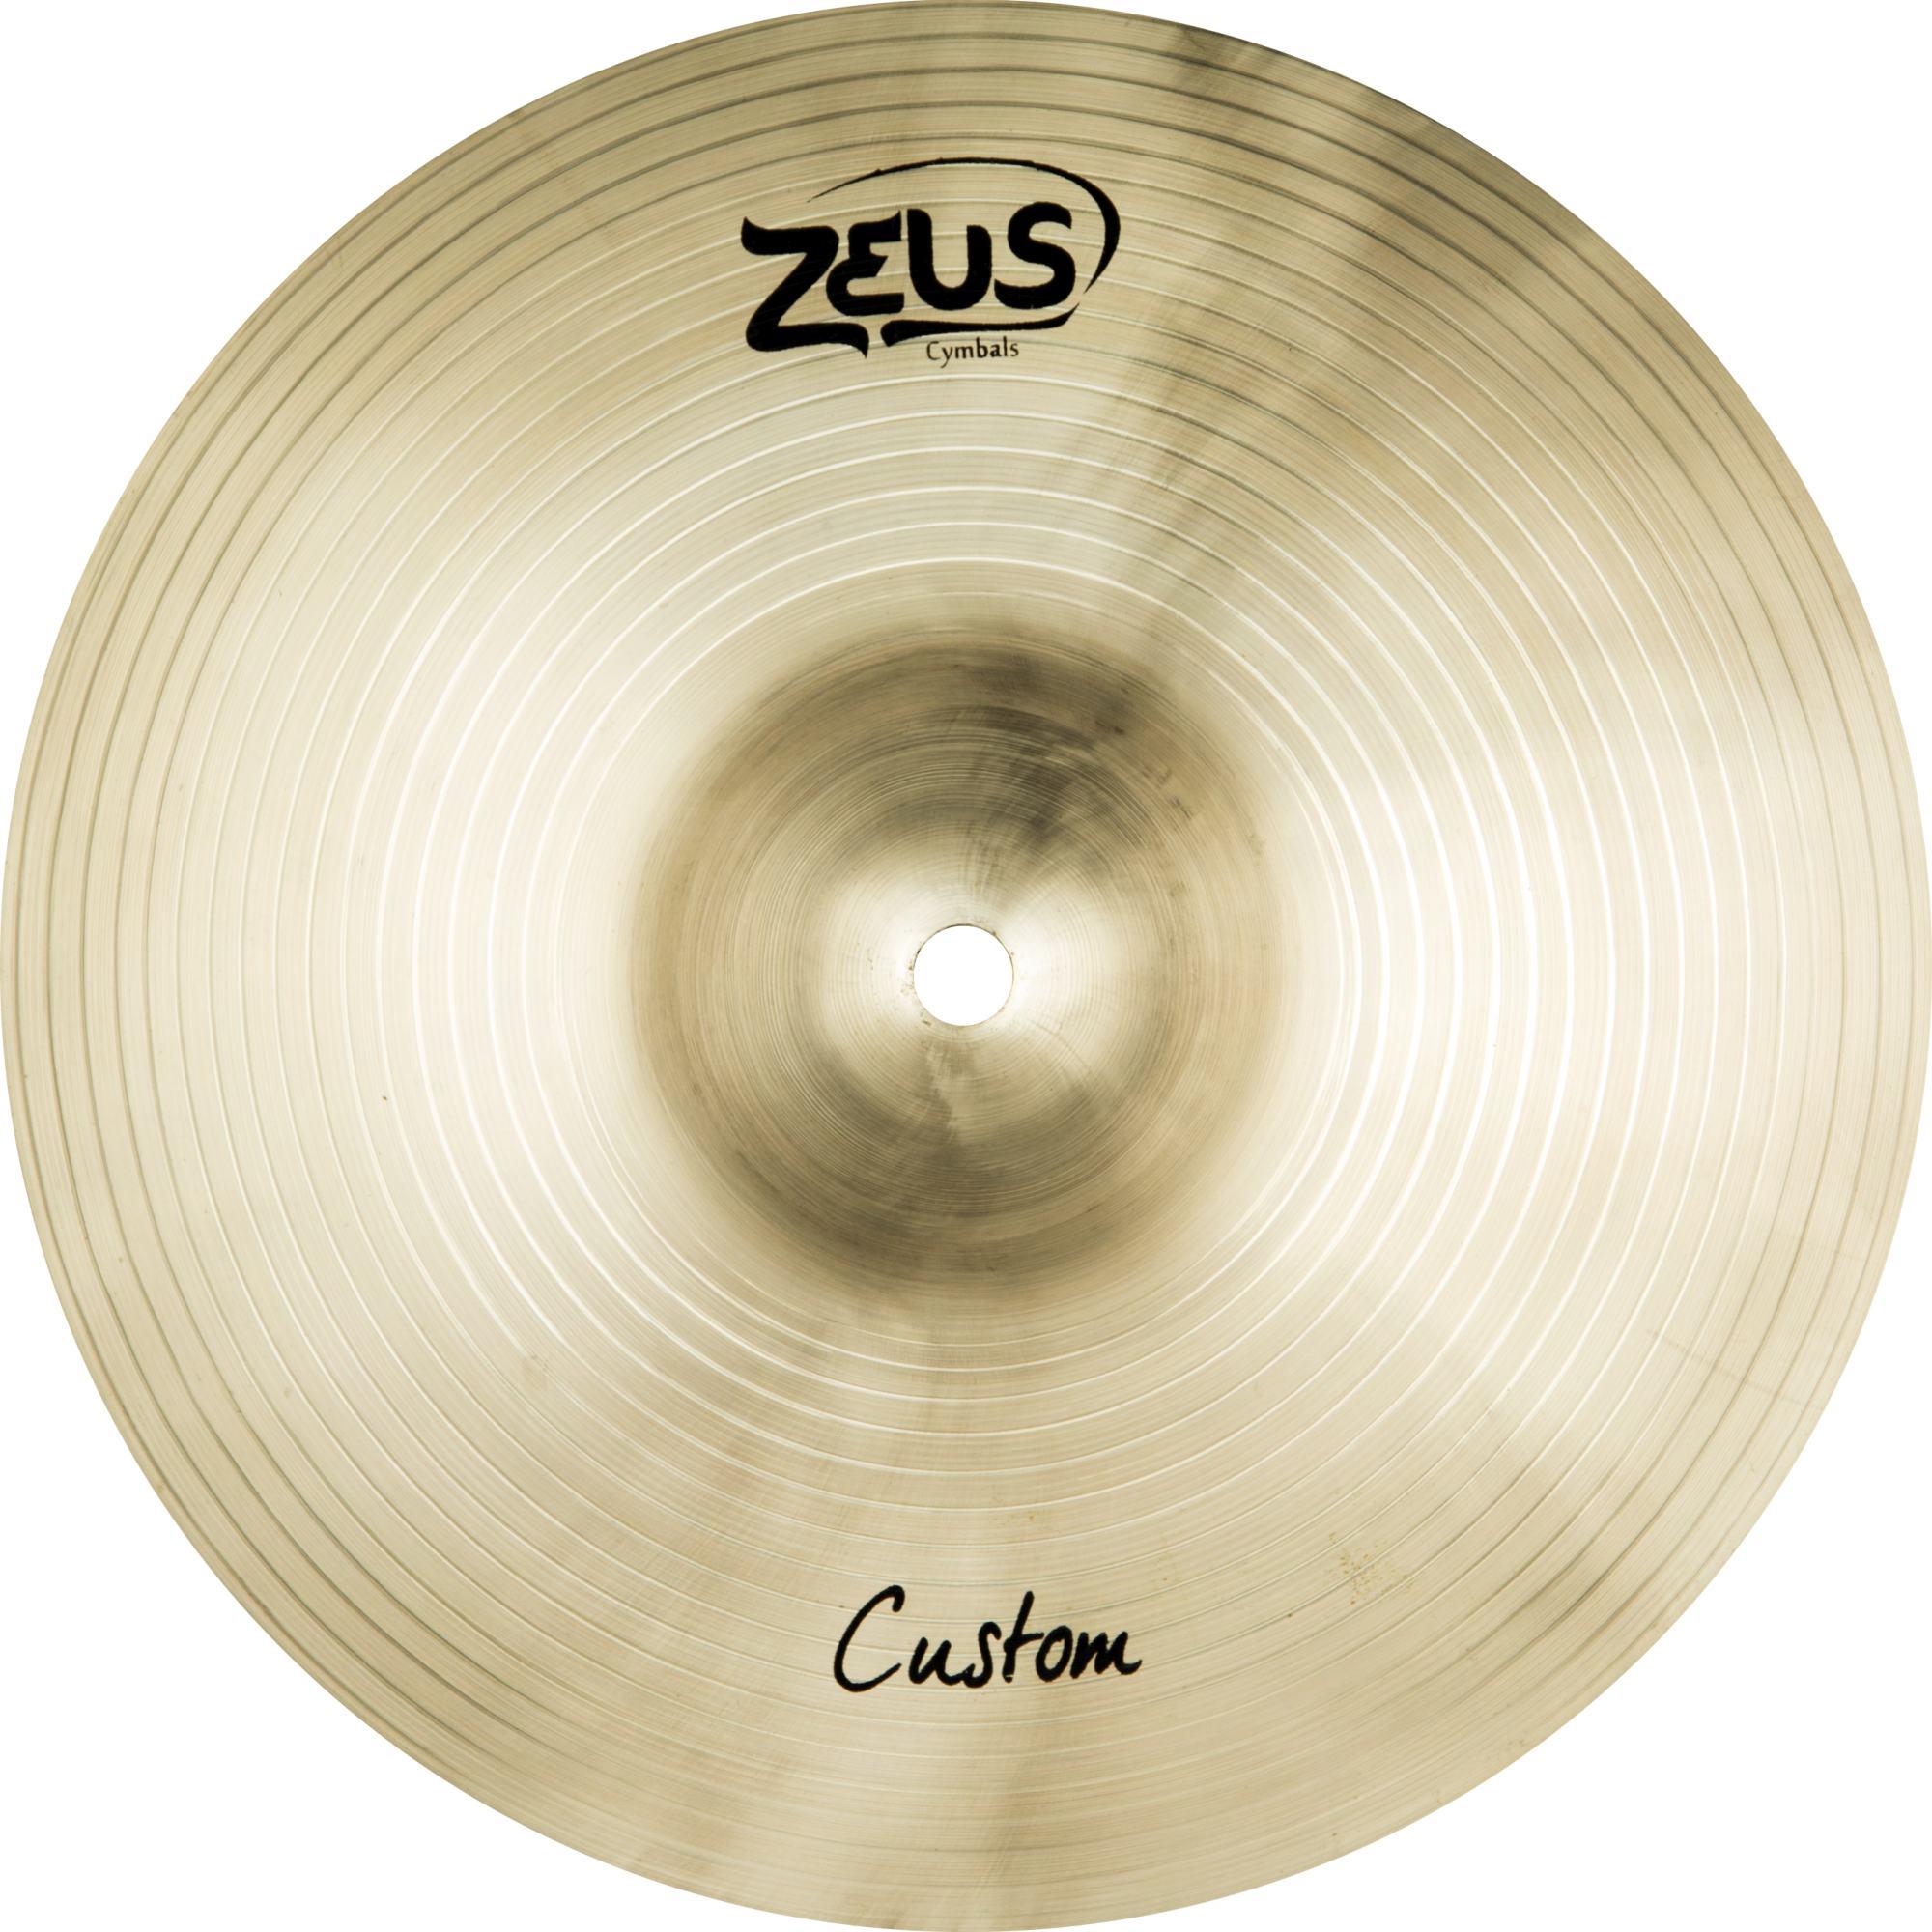 Prato Zeus Custom Splash 10 Zcs10